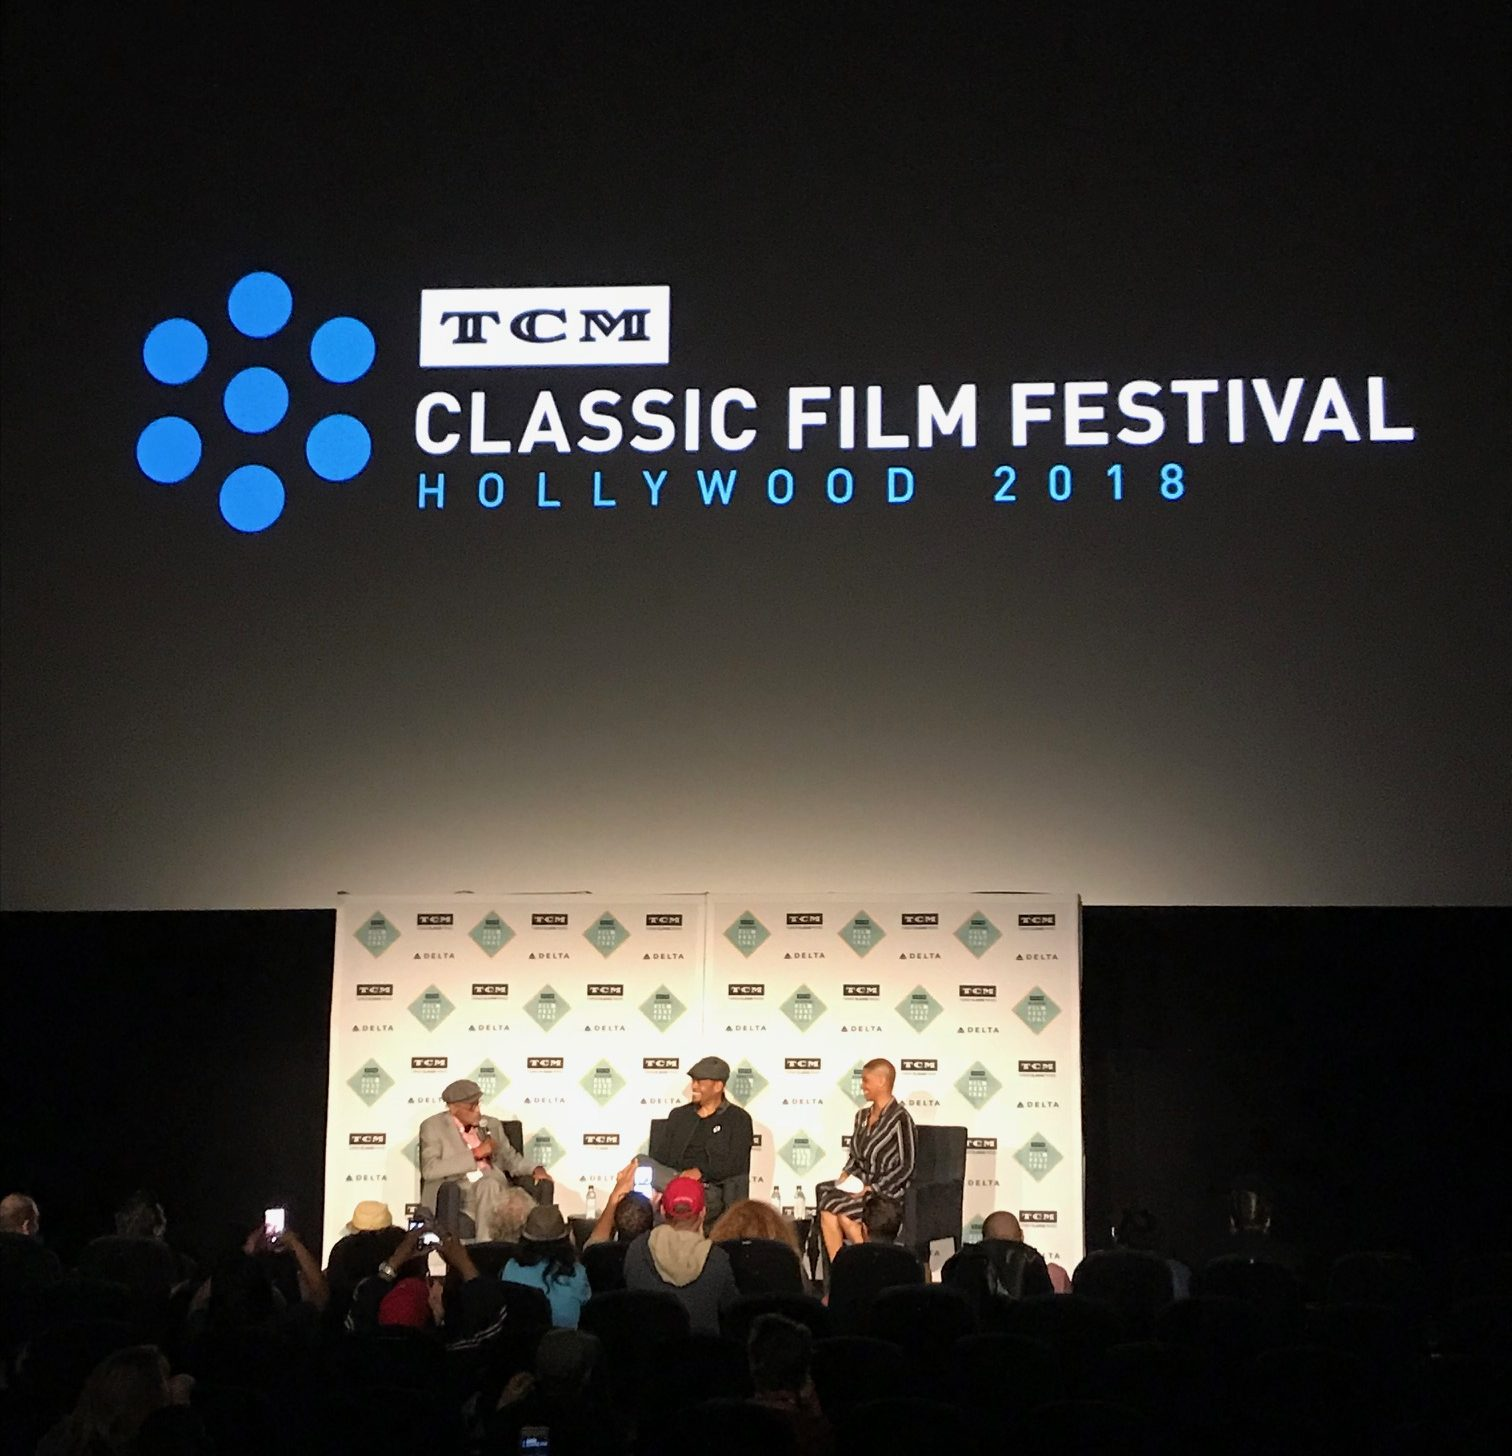 Melvin Van Peebles Sweet Sweetback 2018 TCM Film Festival